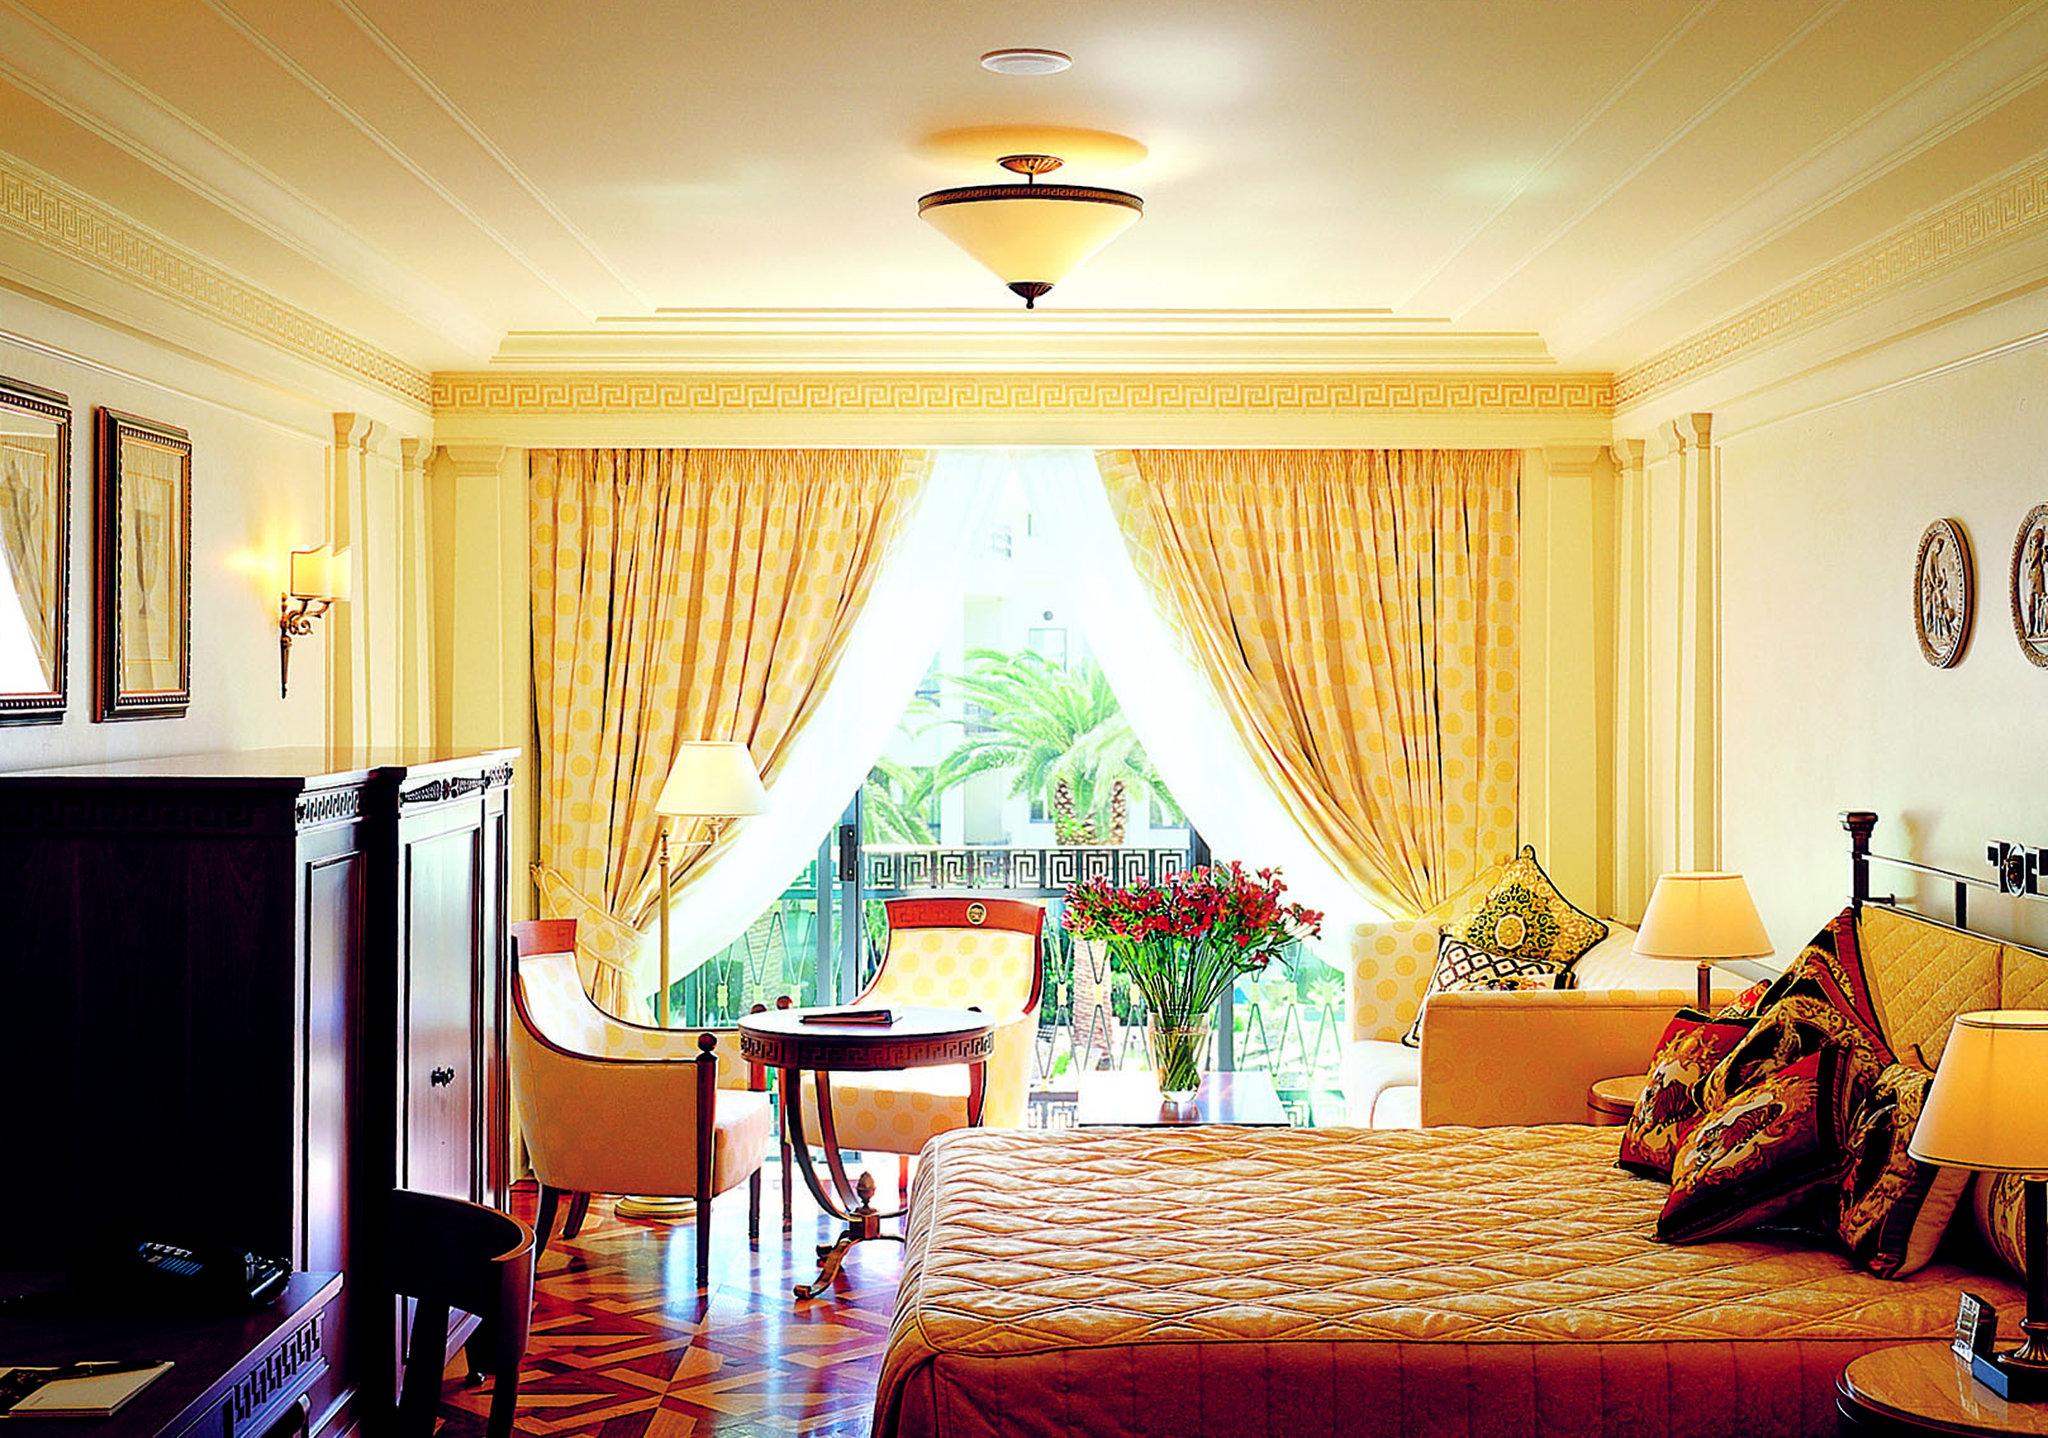 Wedding destination Palazzo Versace Gold Coast, Australia